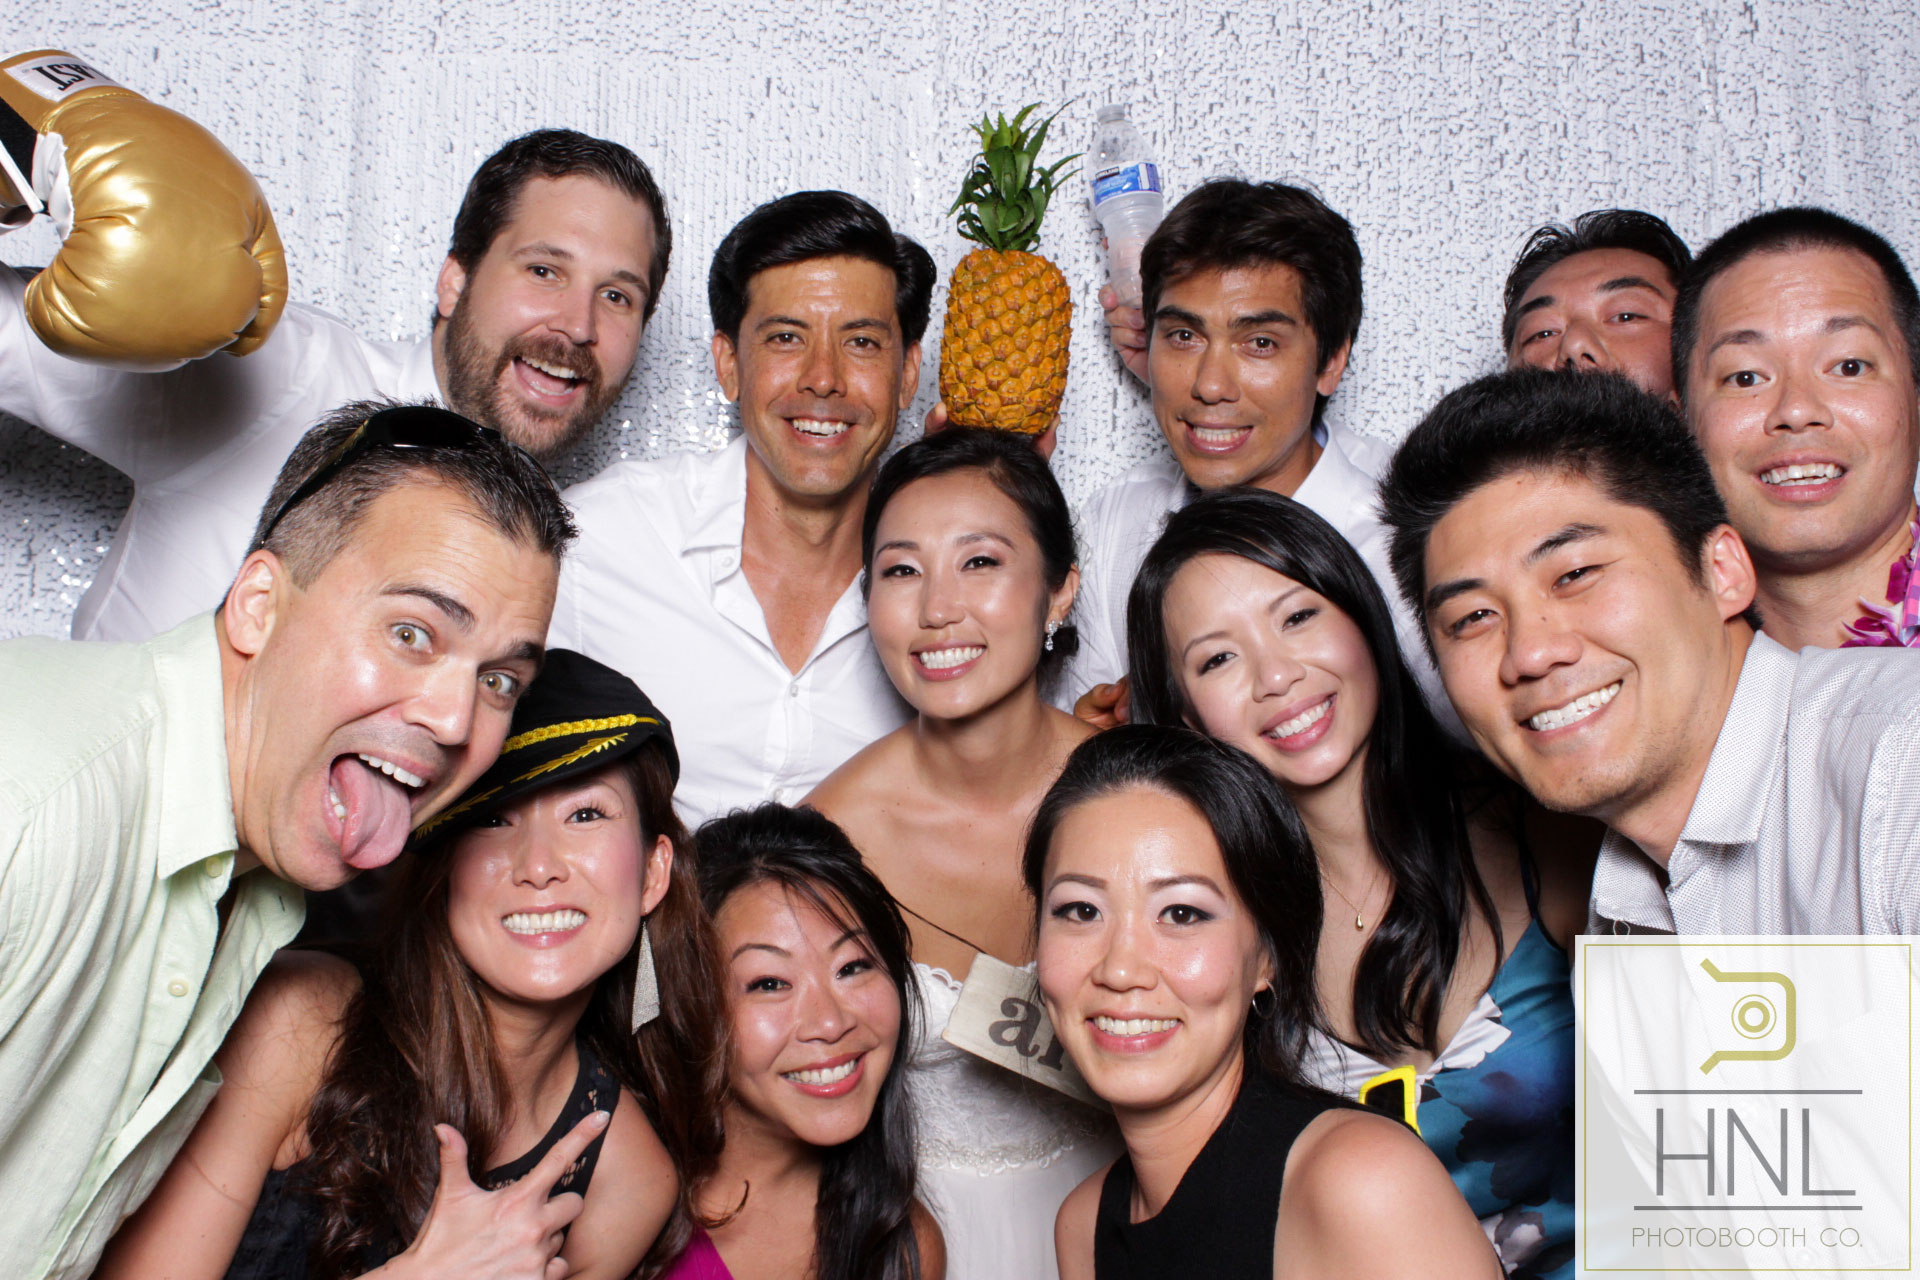 Miki and Dan wedding photo booth Lanikohonua Kapolei Oahu Hawaii  (22).jpg